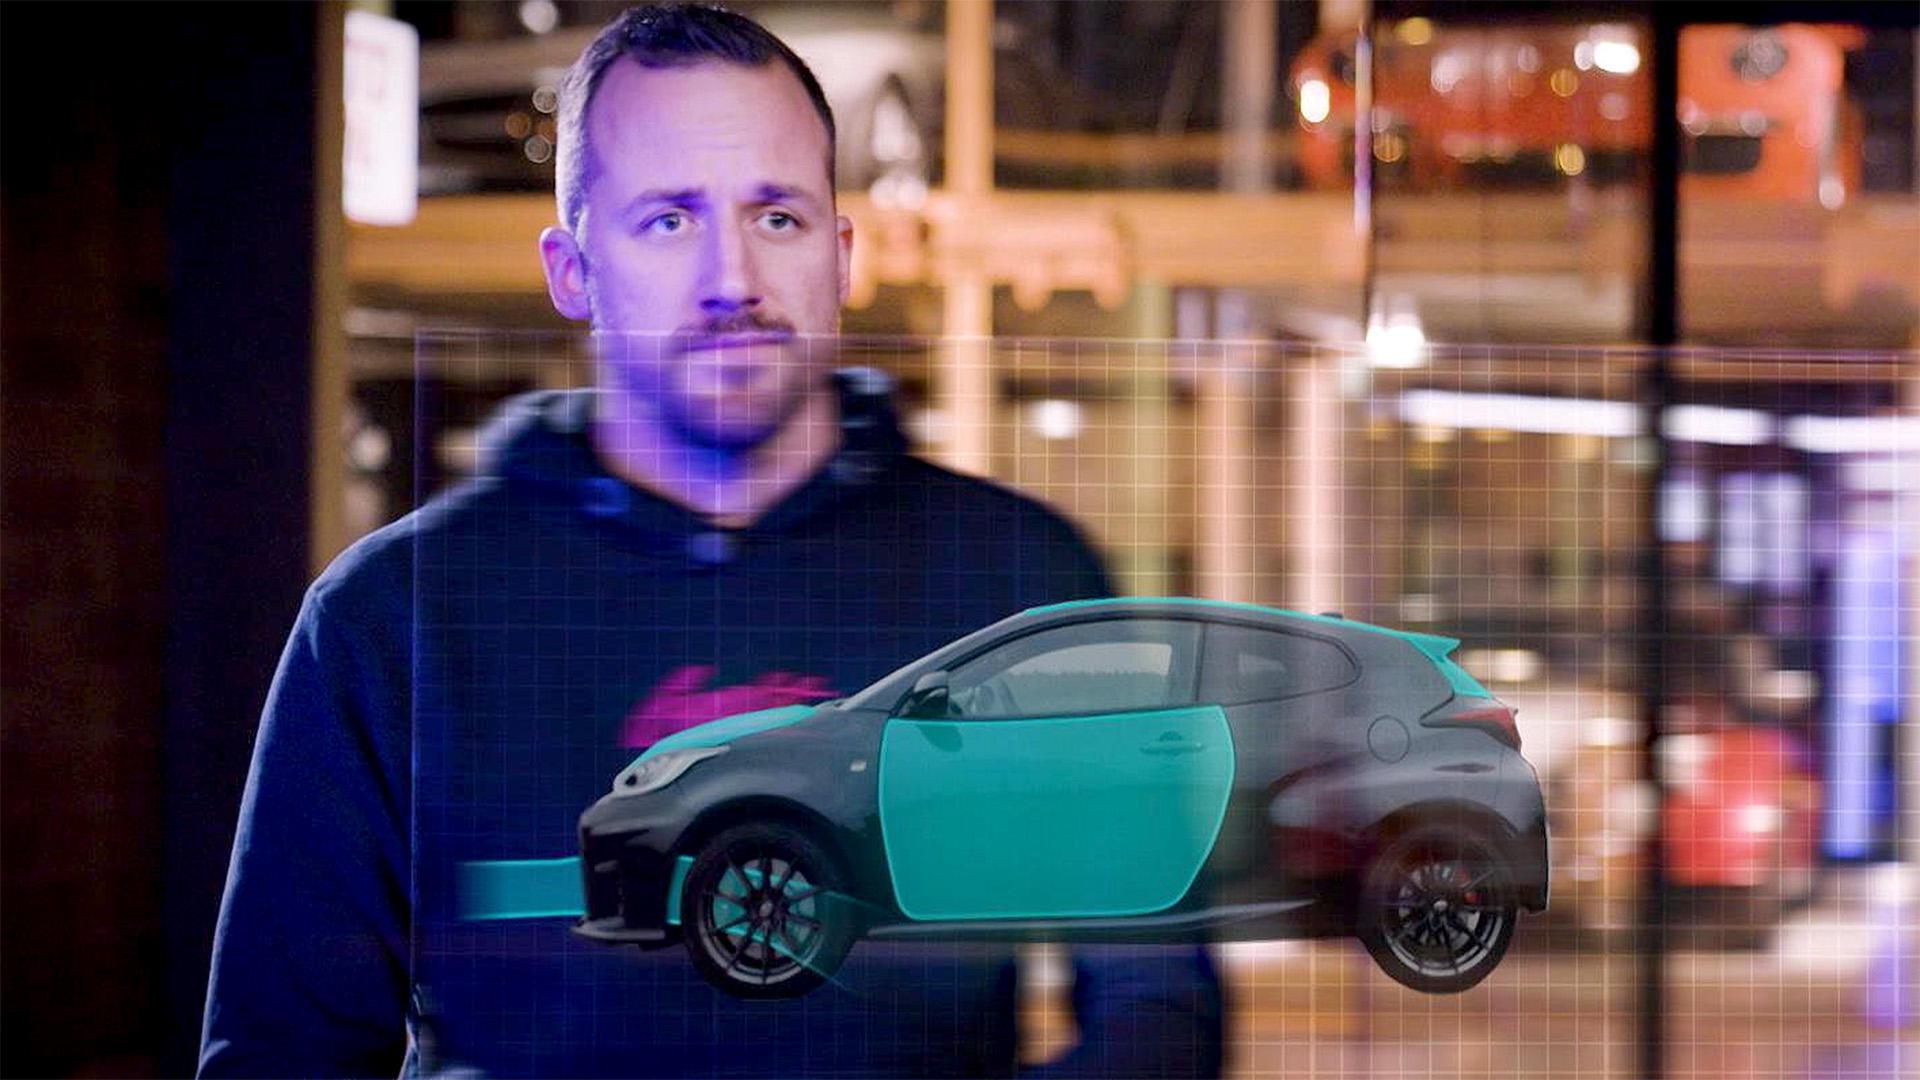 Heute u.a.: Lance testet den Toyota GR Yaris | Folge 10